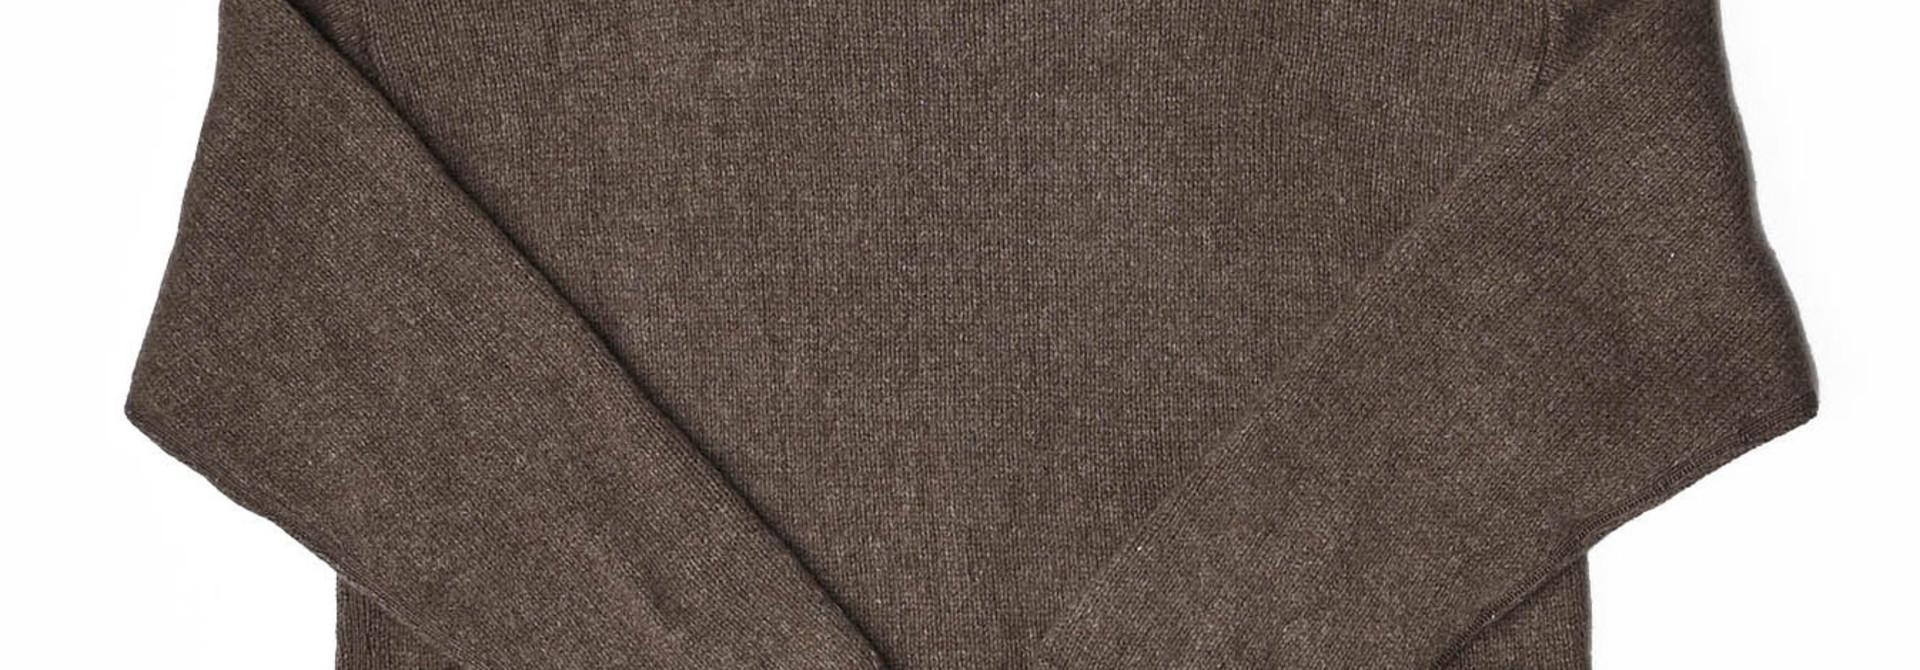 45 Star Cashmere Umahiko Sweater